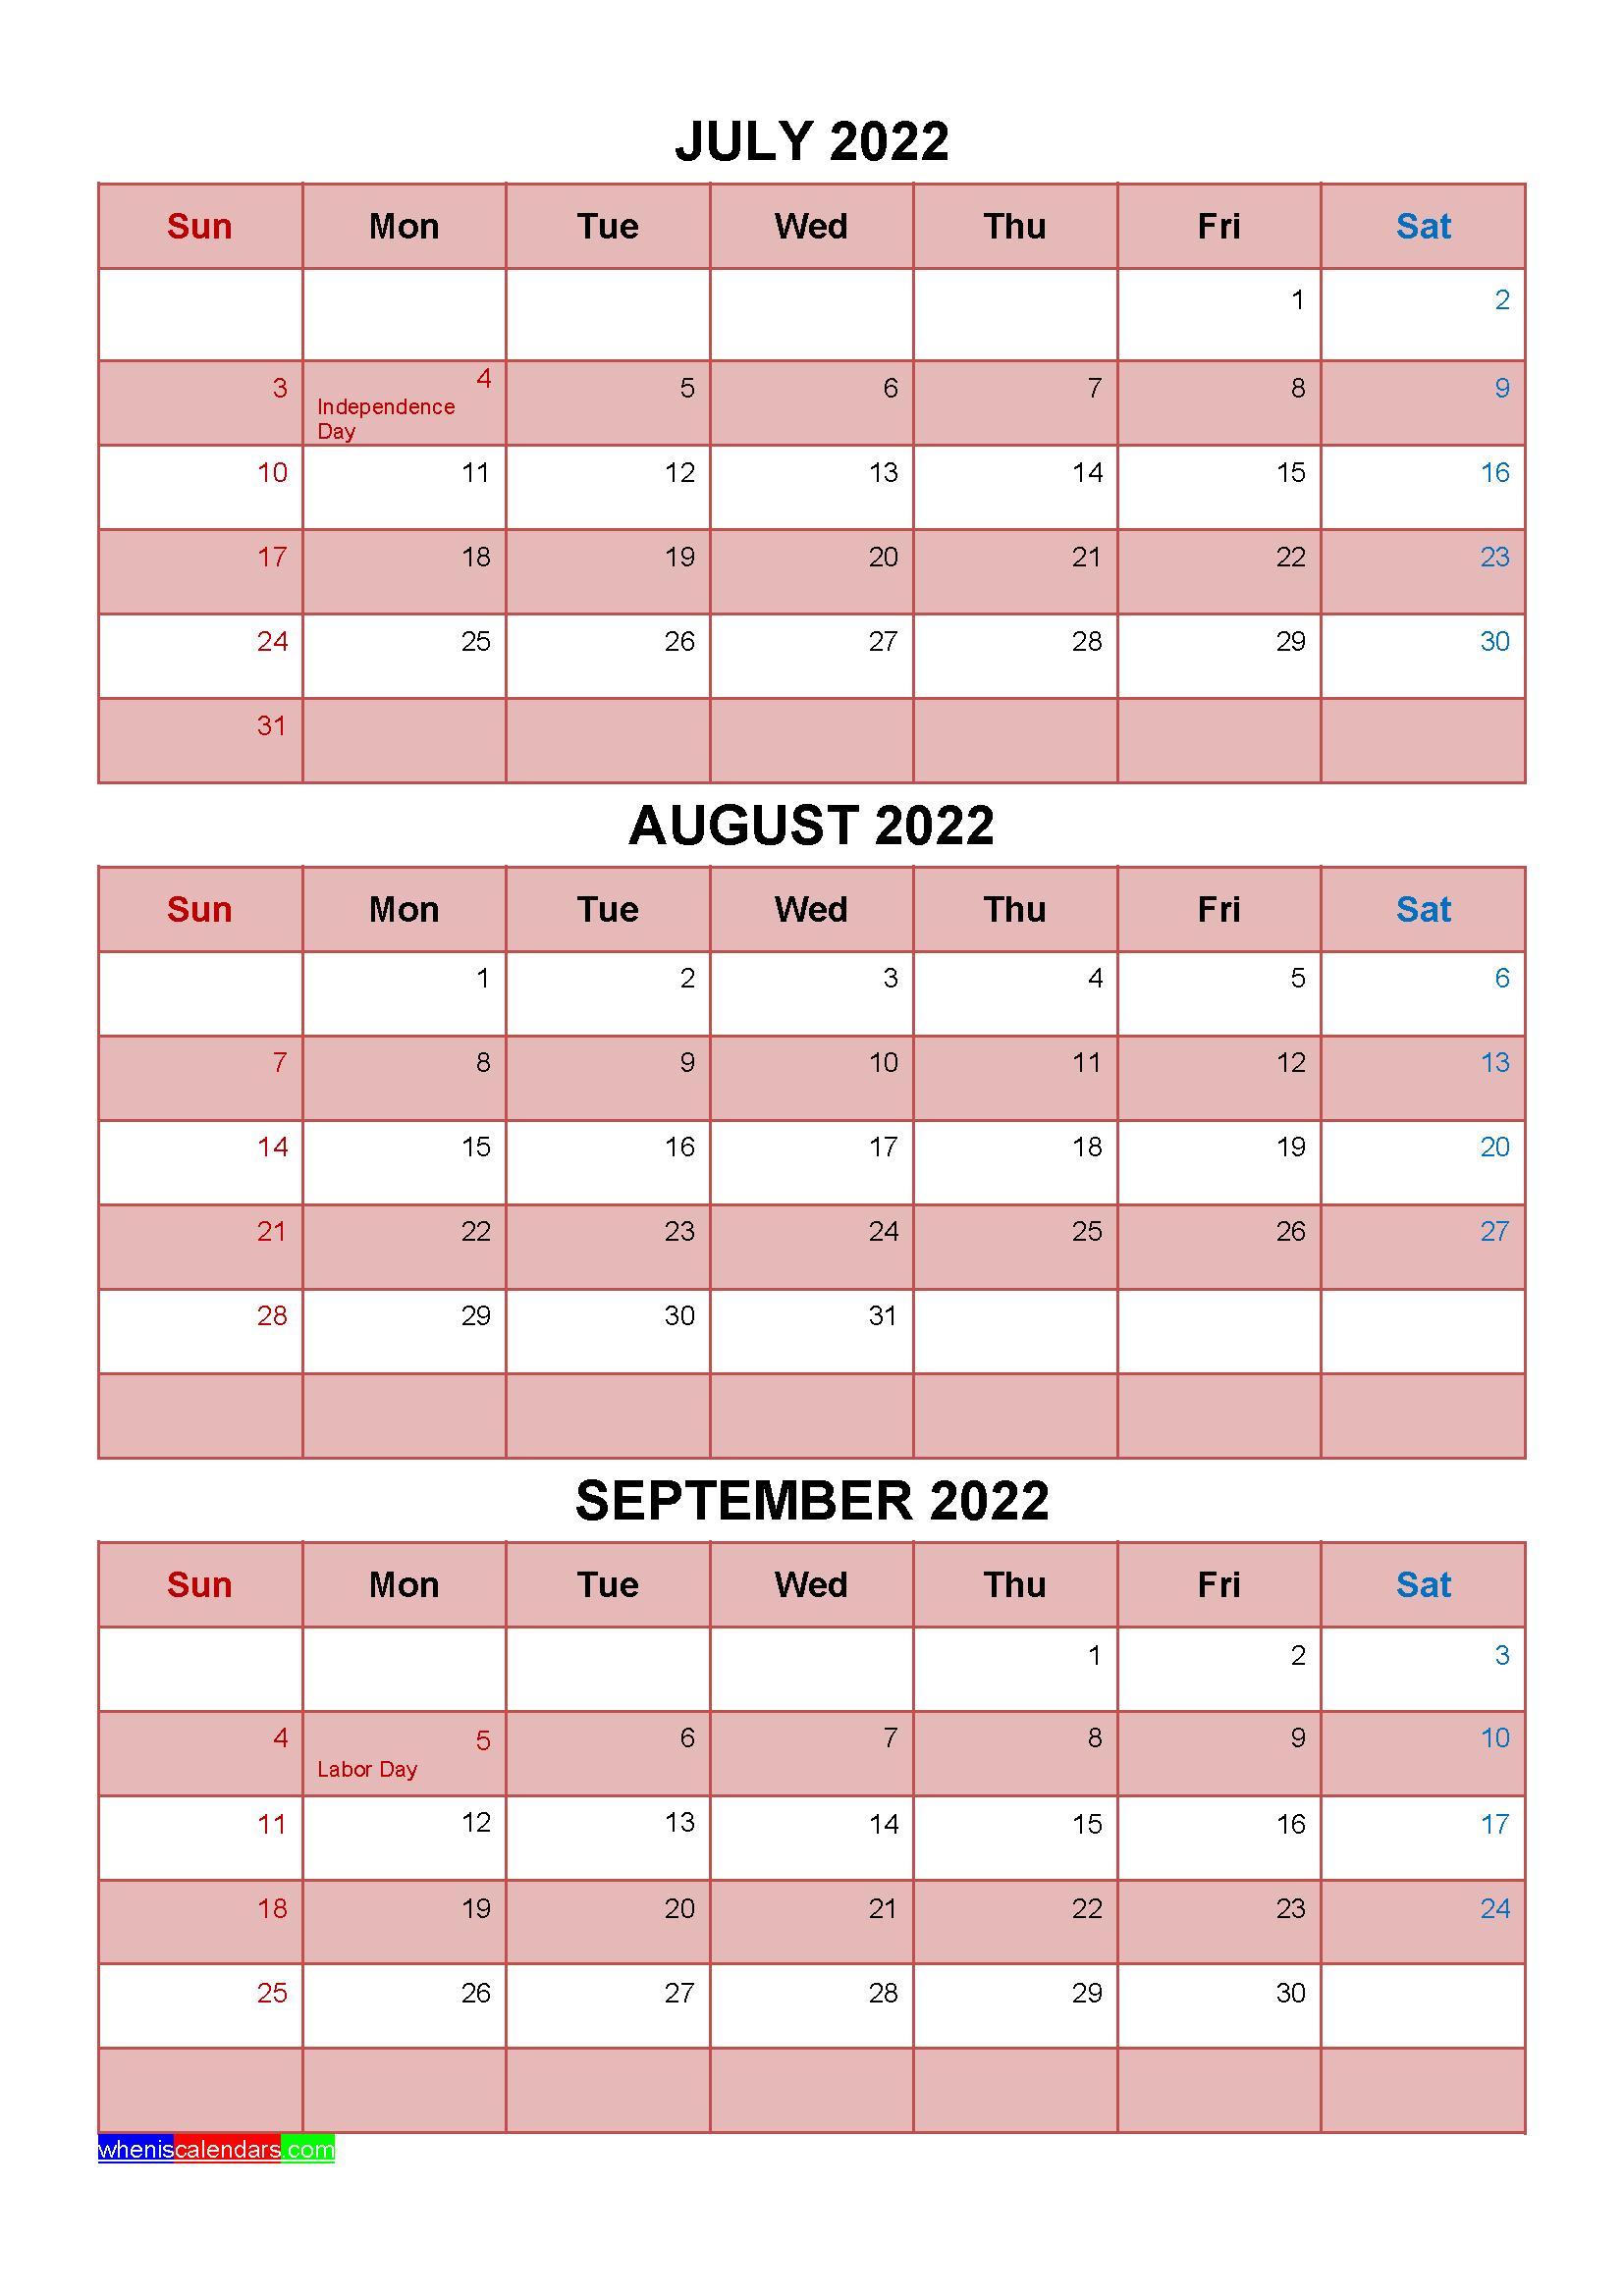 September To December 2022 Calendar.Printable July August September 2022 Calendar With Holidays Four Quarters January February March Holiday Printables Calendar Printables